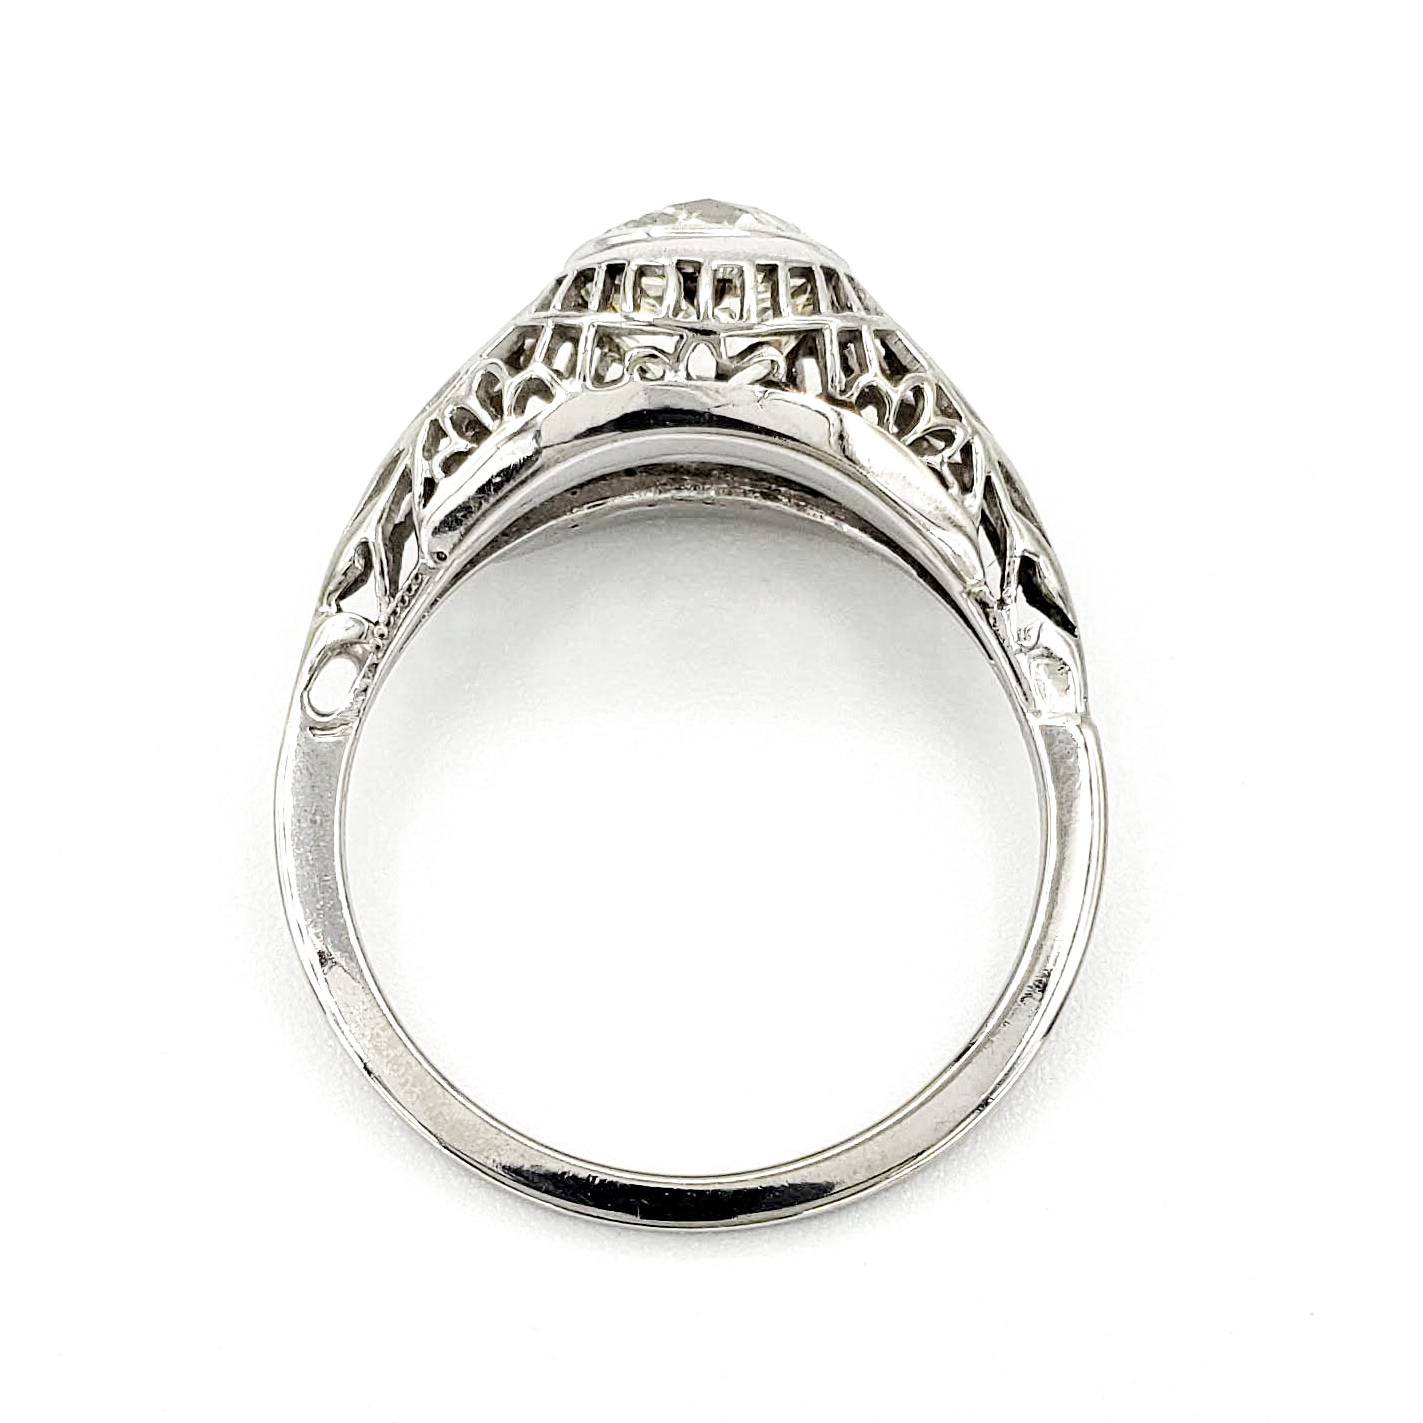 vintage-18-karat-gold-engagement-ring-with-1-46-carat-old-mine-cut-diamond-egl-j-si2